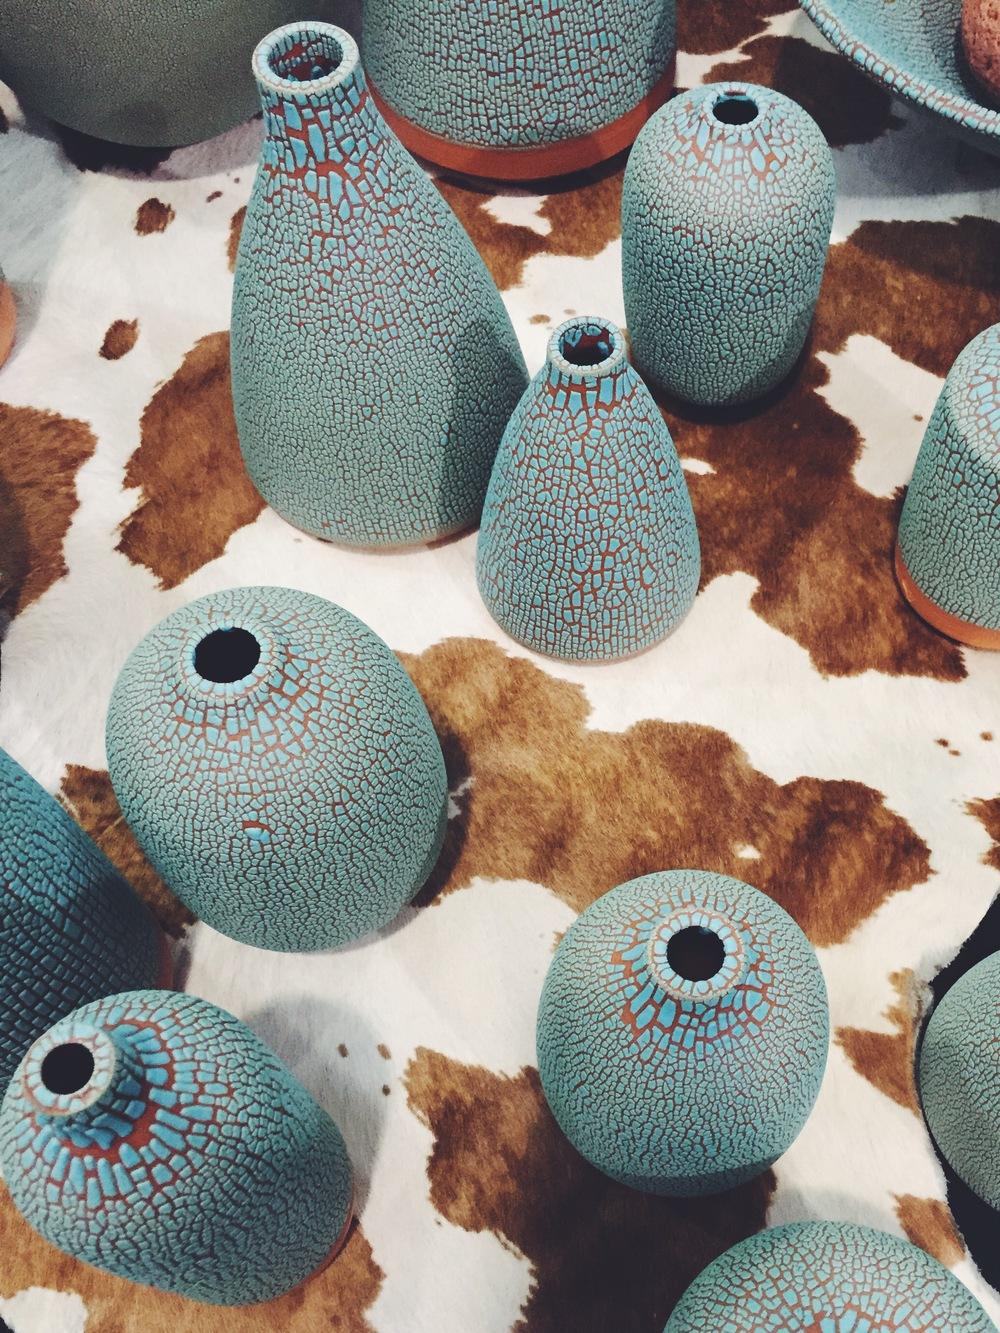 Heather Rosenman Ceramics